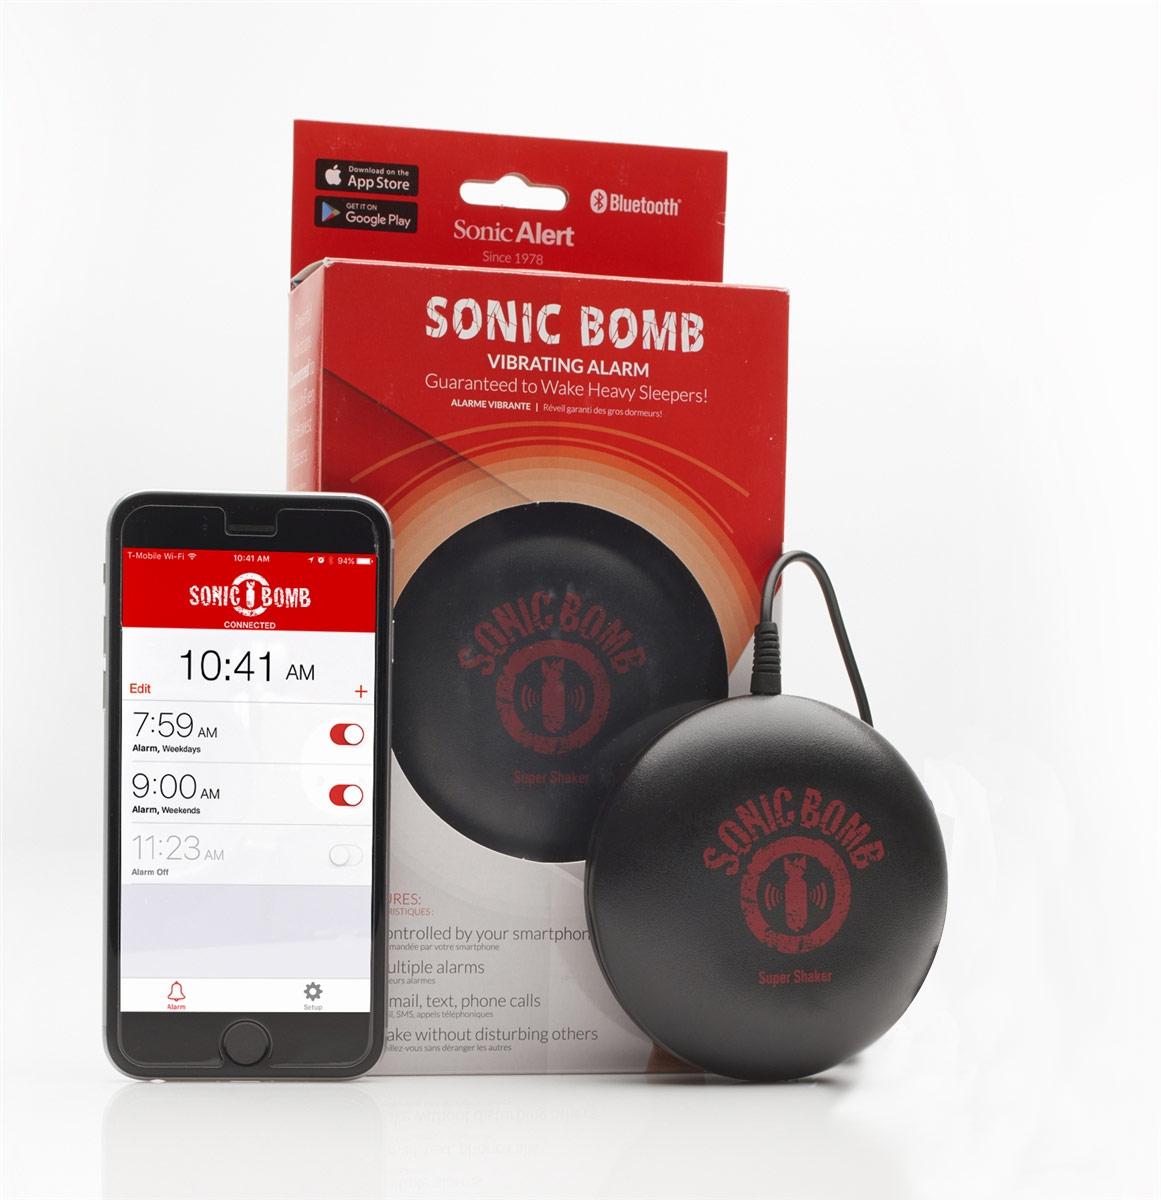 Sonic Bomb Bluetooth Super Shaker Vibrating Alarm - Battery-Powered